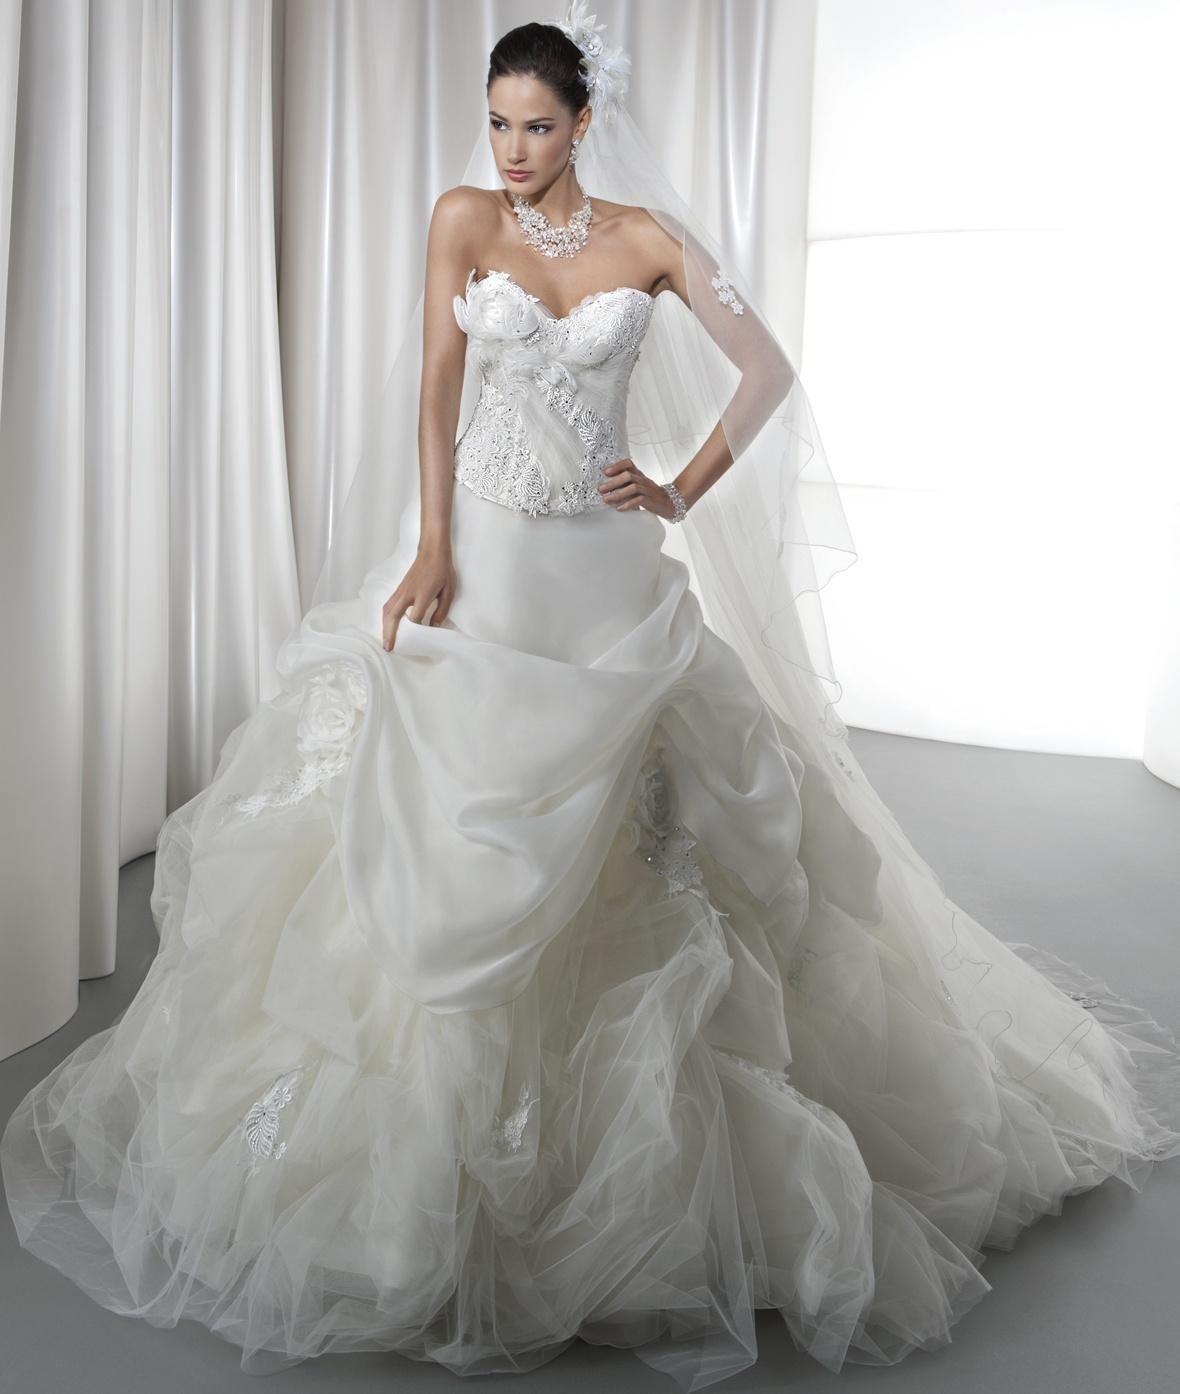 2016 Young Brides Wedding Dresses Demetrios Sweetheart Neckline ...